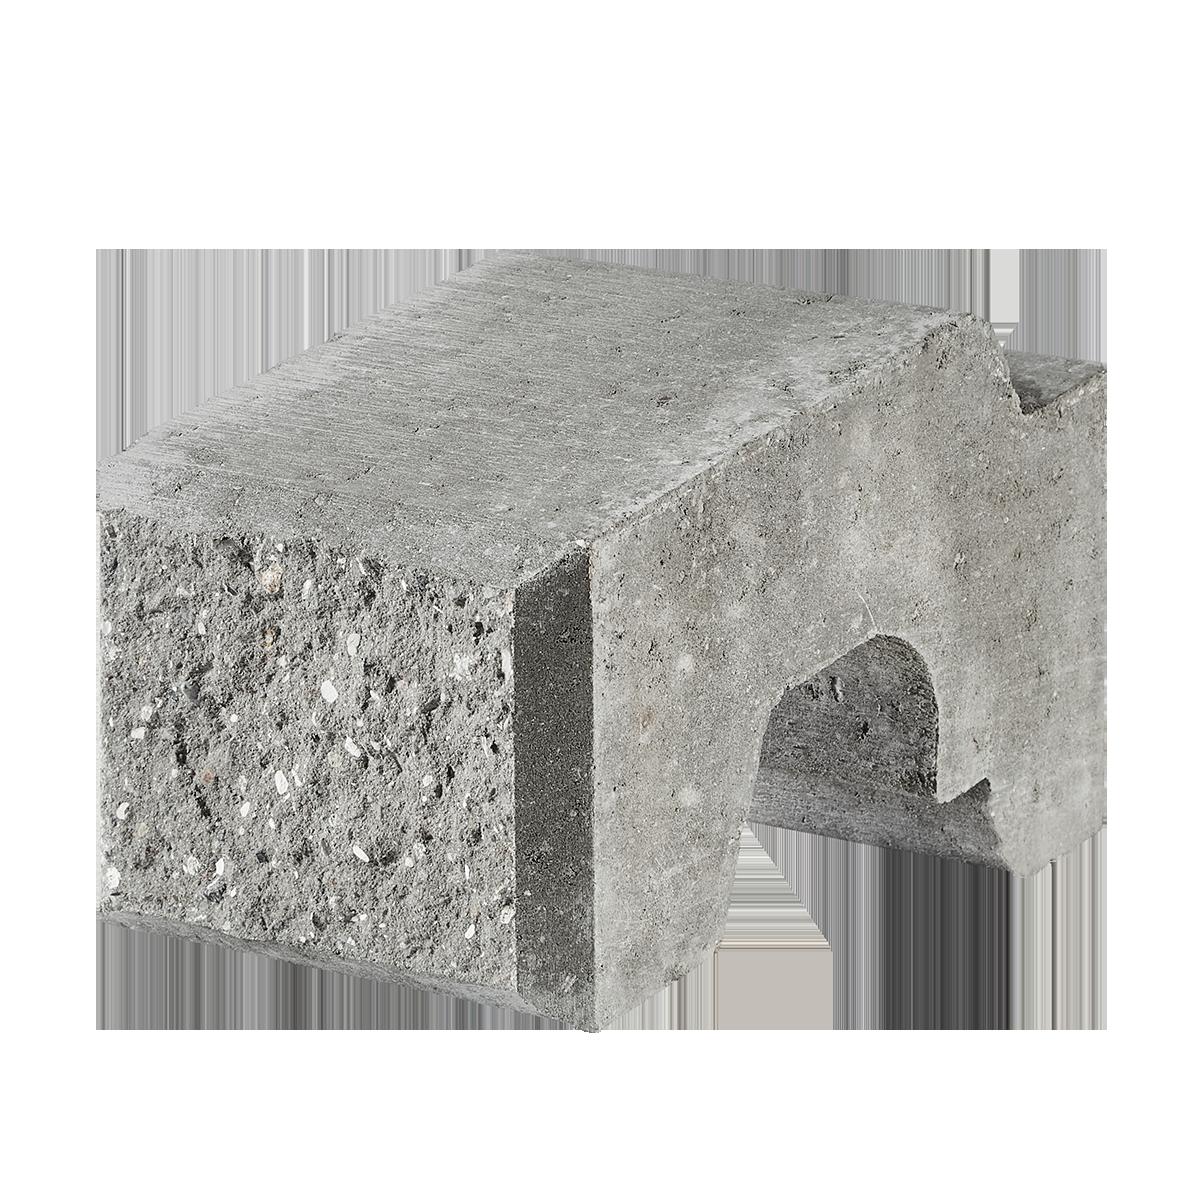 Danblokke Eksklusiv 22,5x34x17 cm Grå  Tilpasningsblok